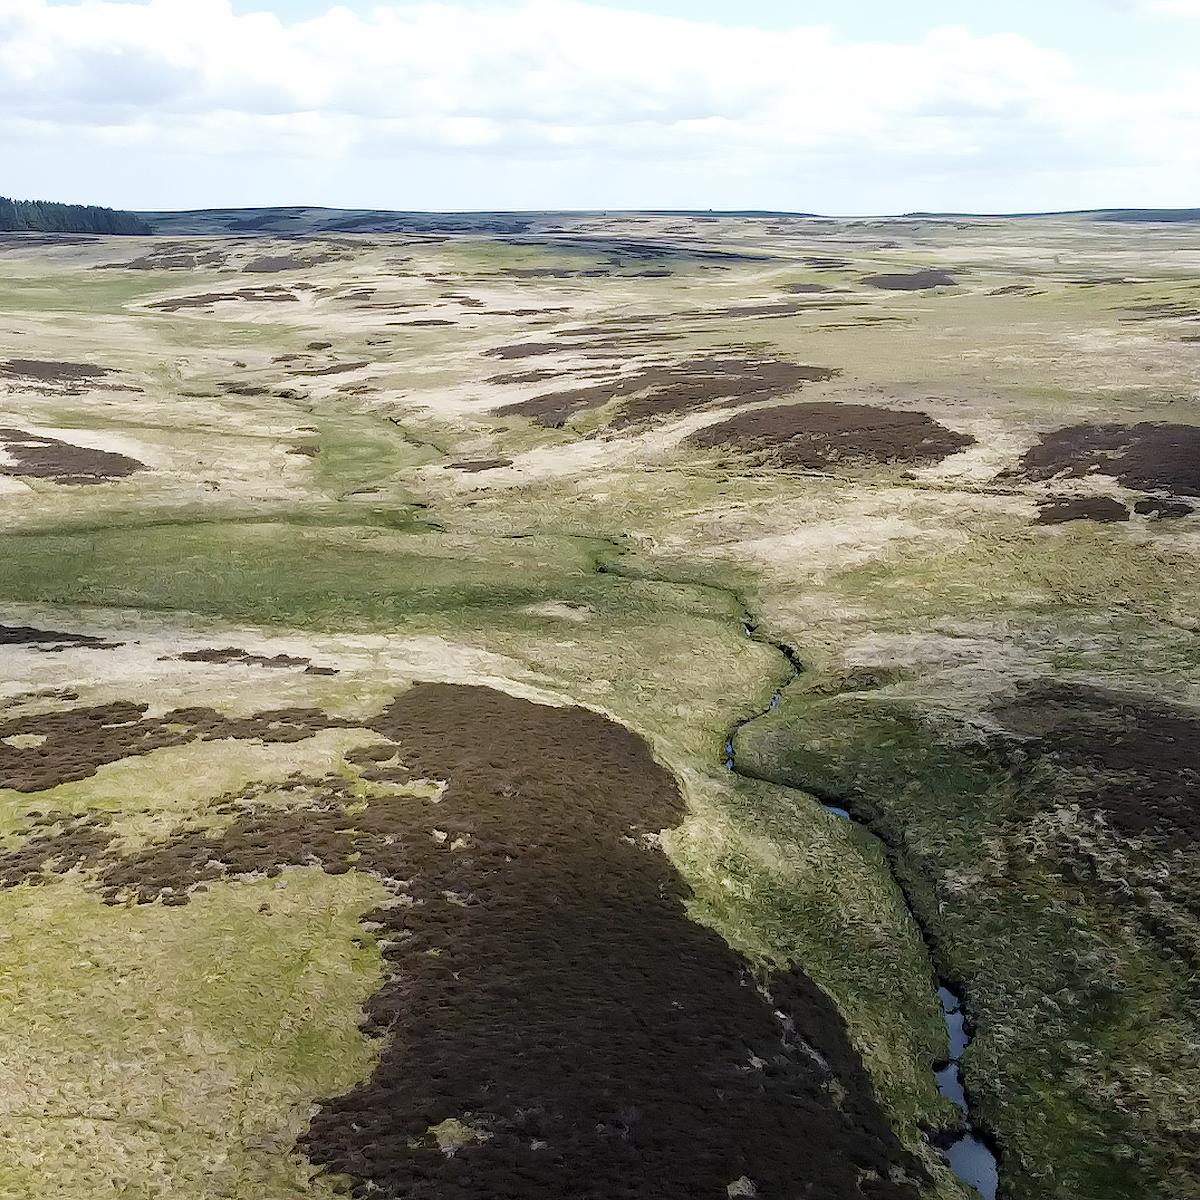 Drone aerials Colin Leighton